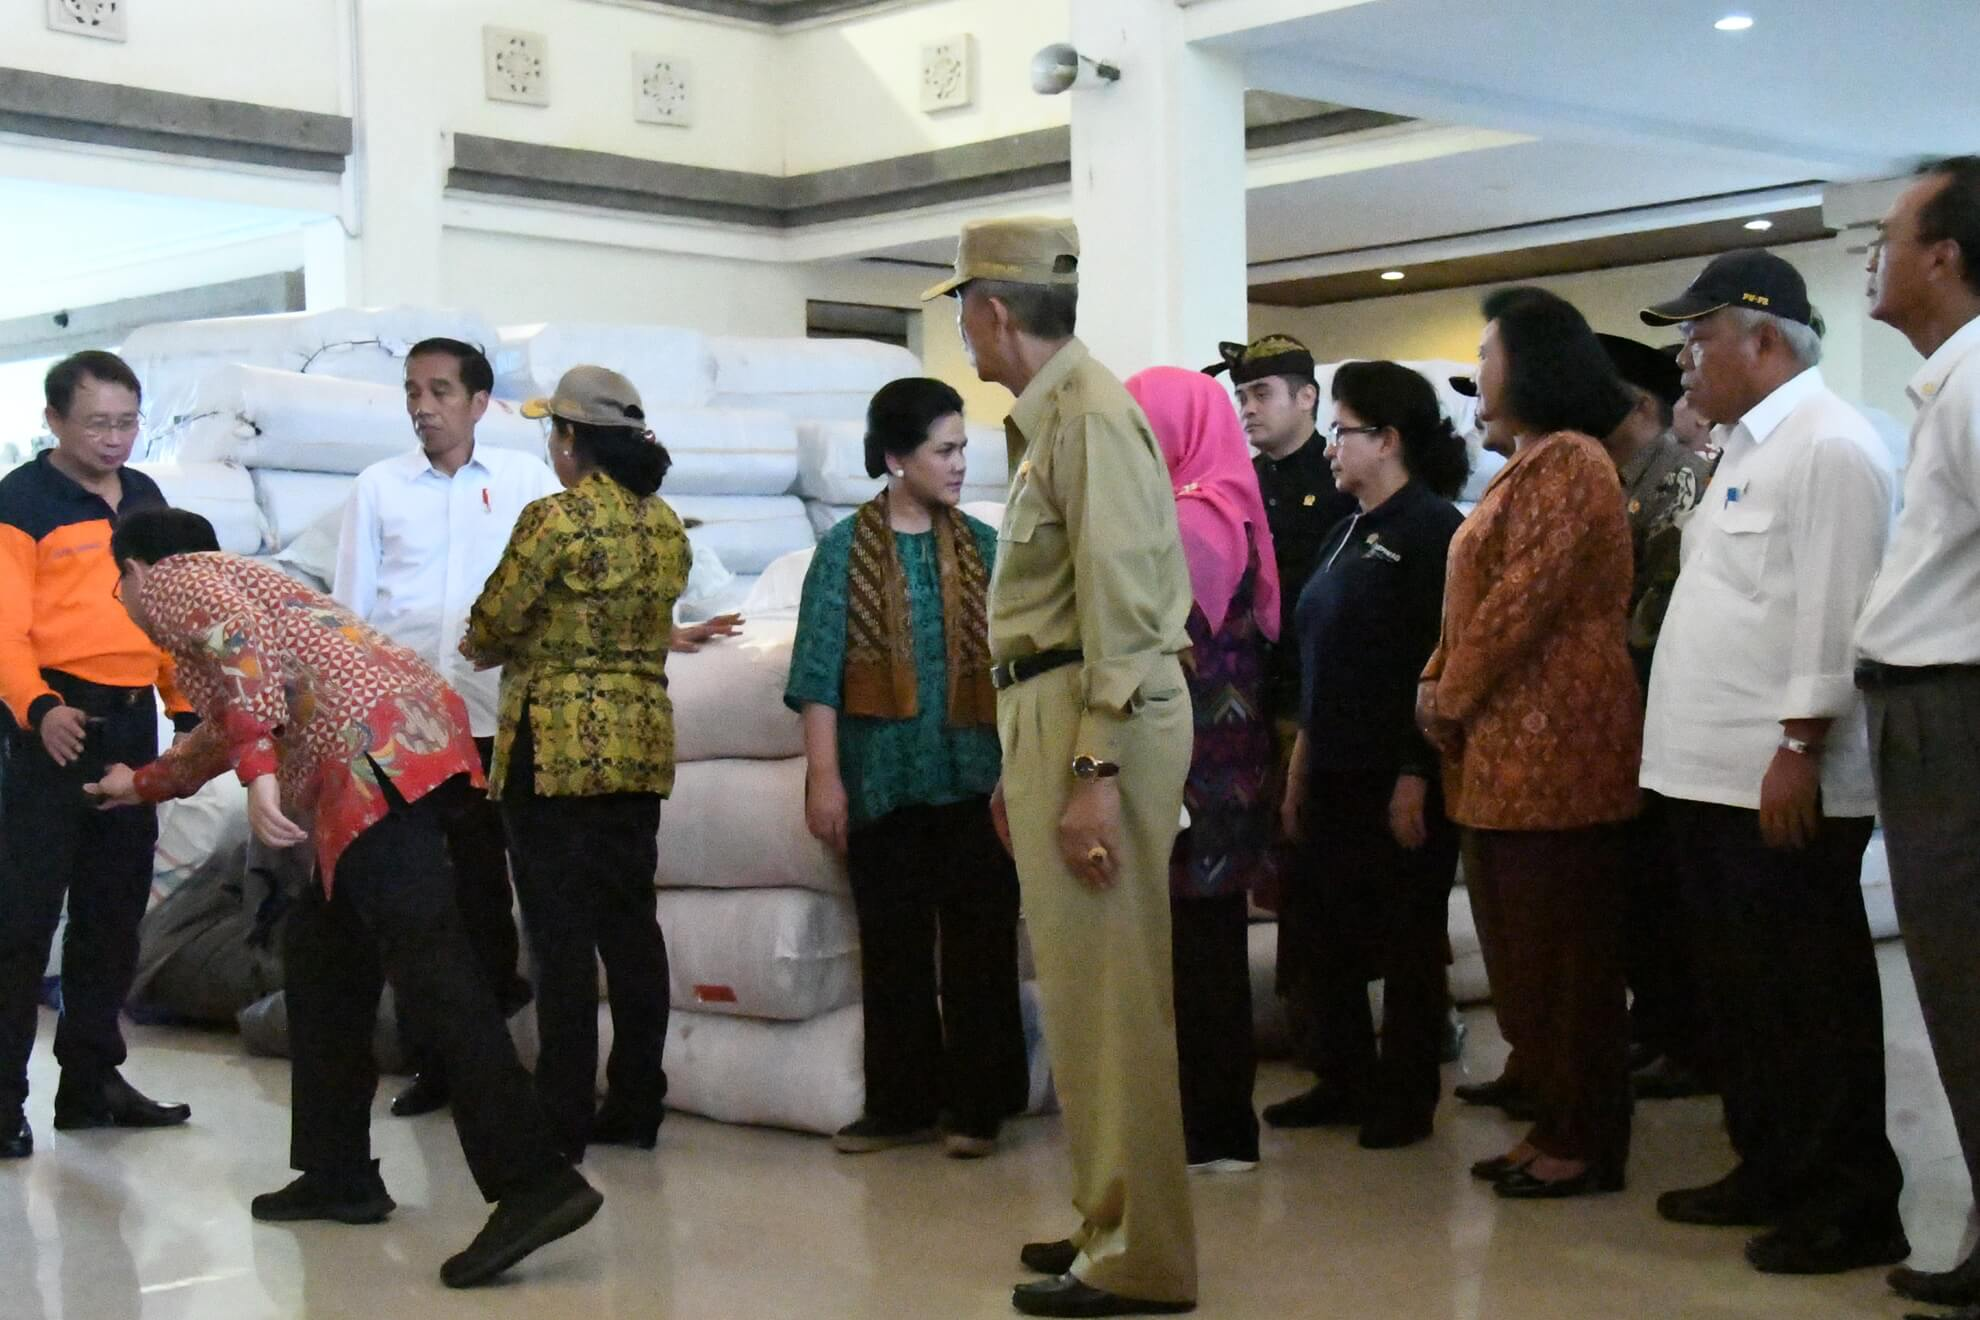 presiden-jokowi-dan-kabinet-kerja-meninjau-kesiapan-logistik-di-pos-komando-bencana-gunung-agung-desa-karangasem-jpg